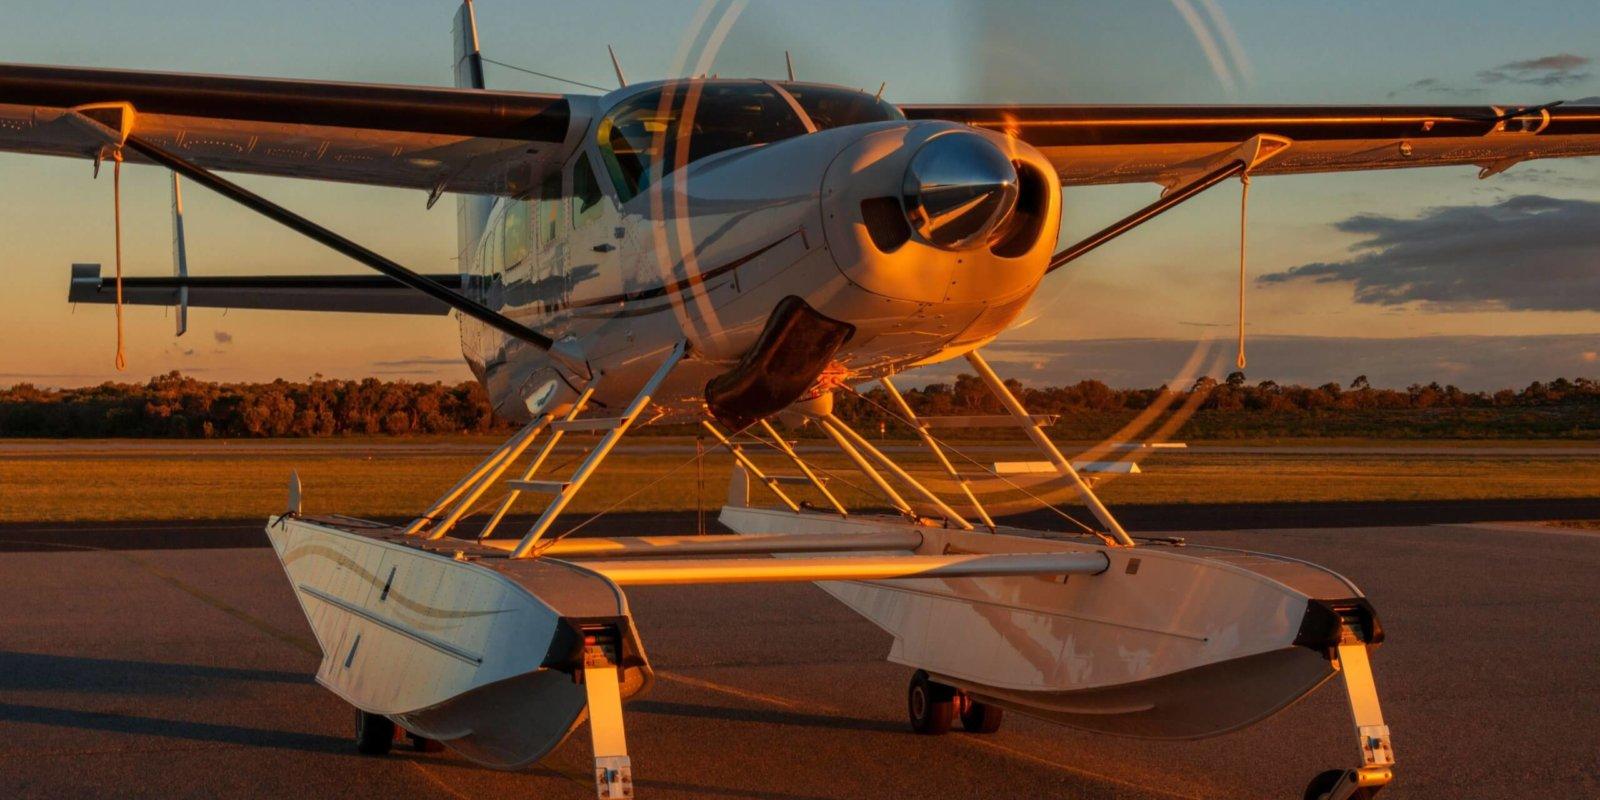 Sunset illuminating a Cessna 208 Grand Caravan float plane.